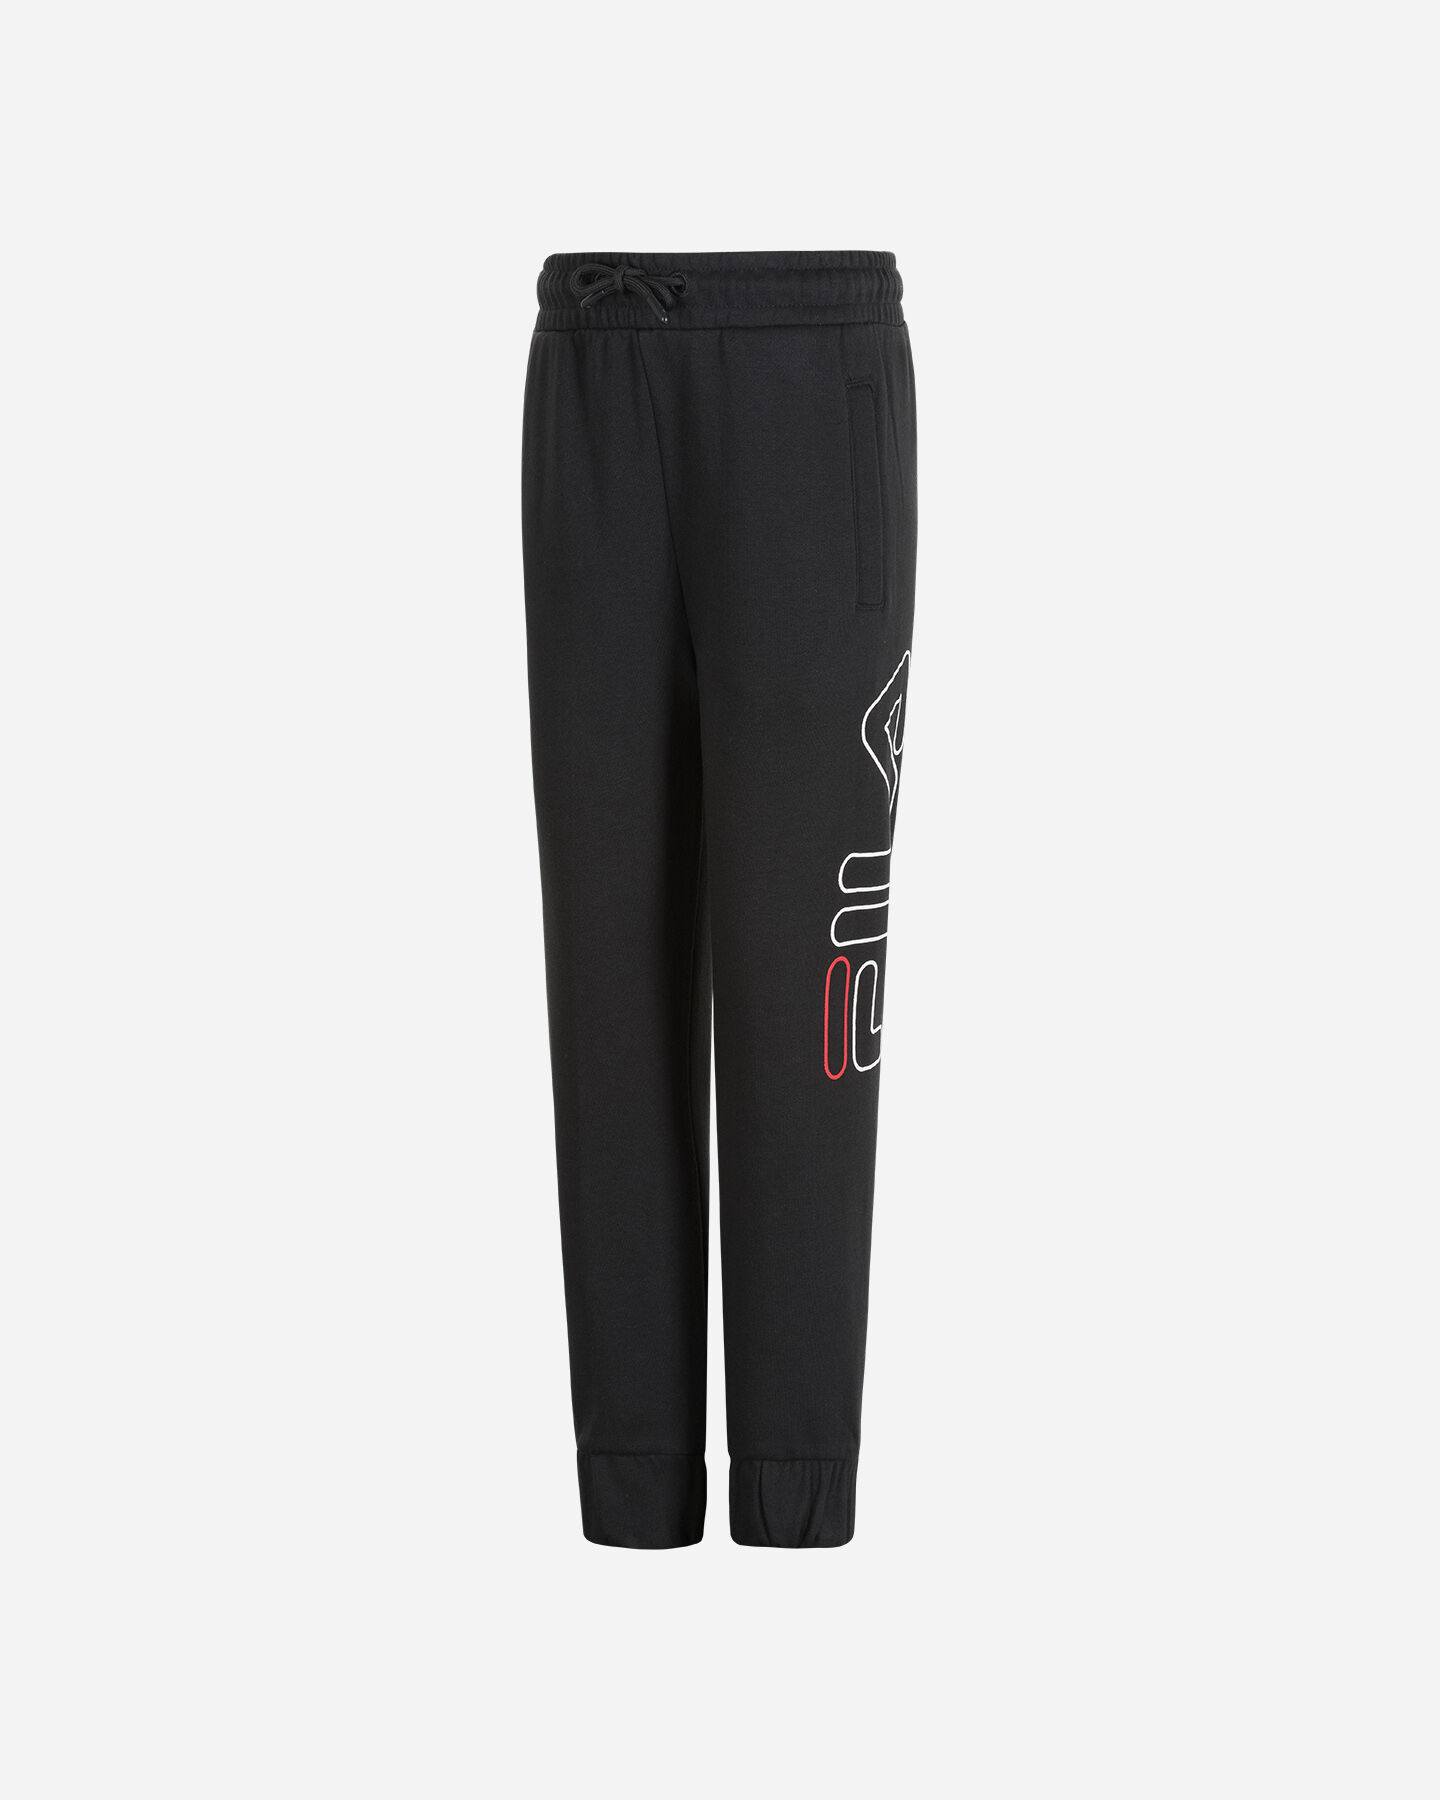 Pantalone FILA BIG LOGO JR S4081466 scatto 0